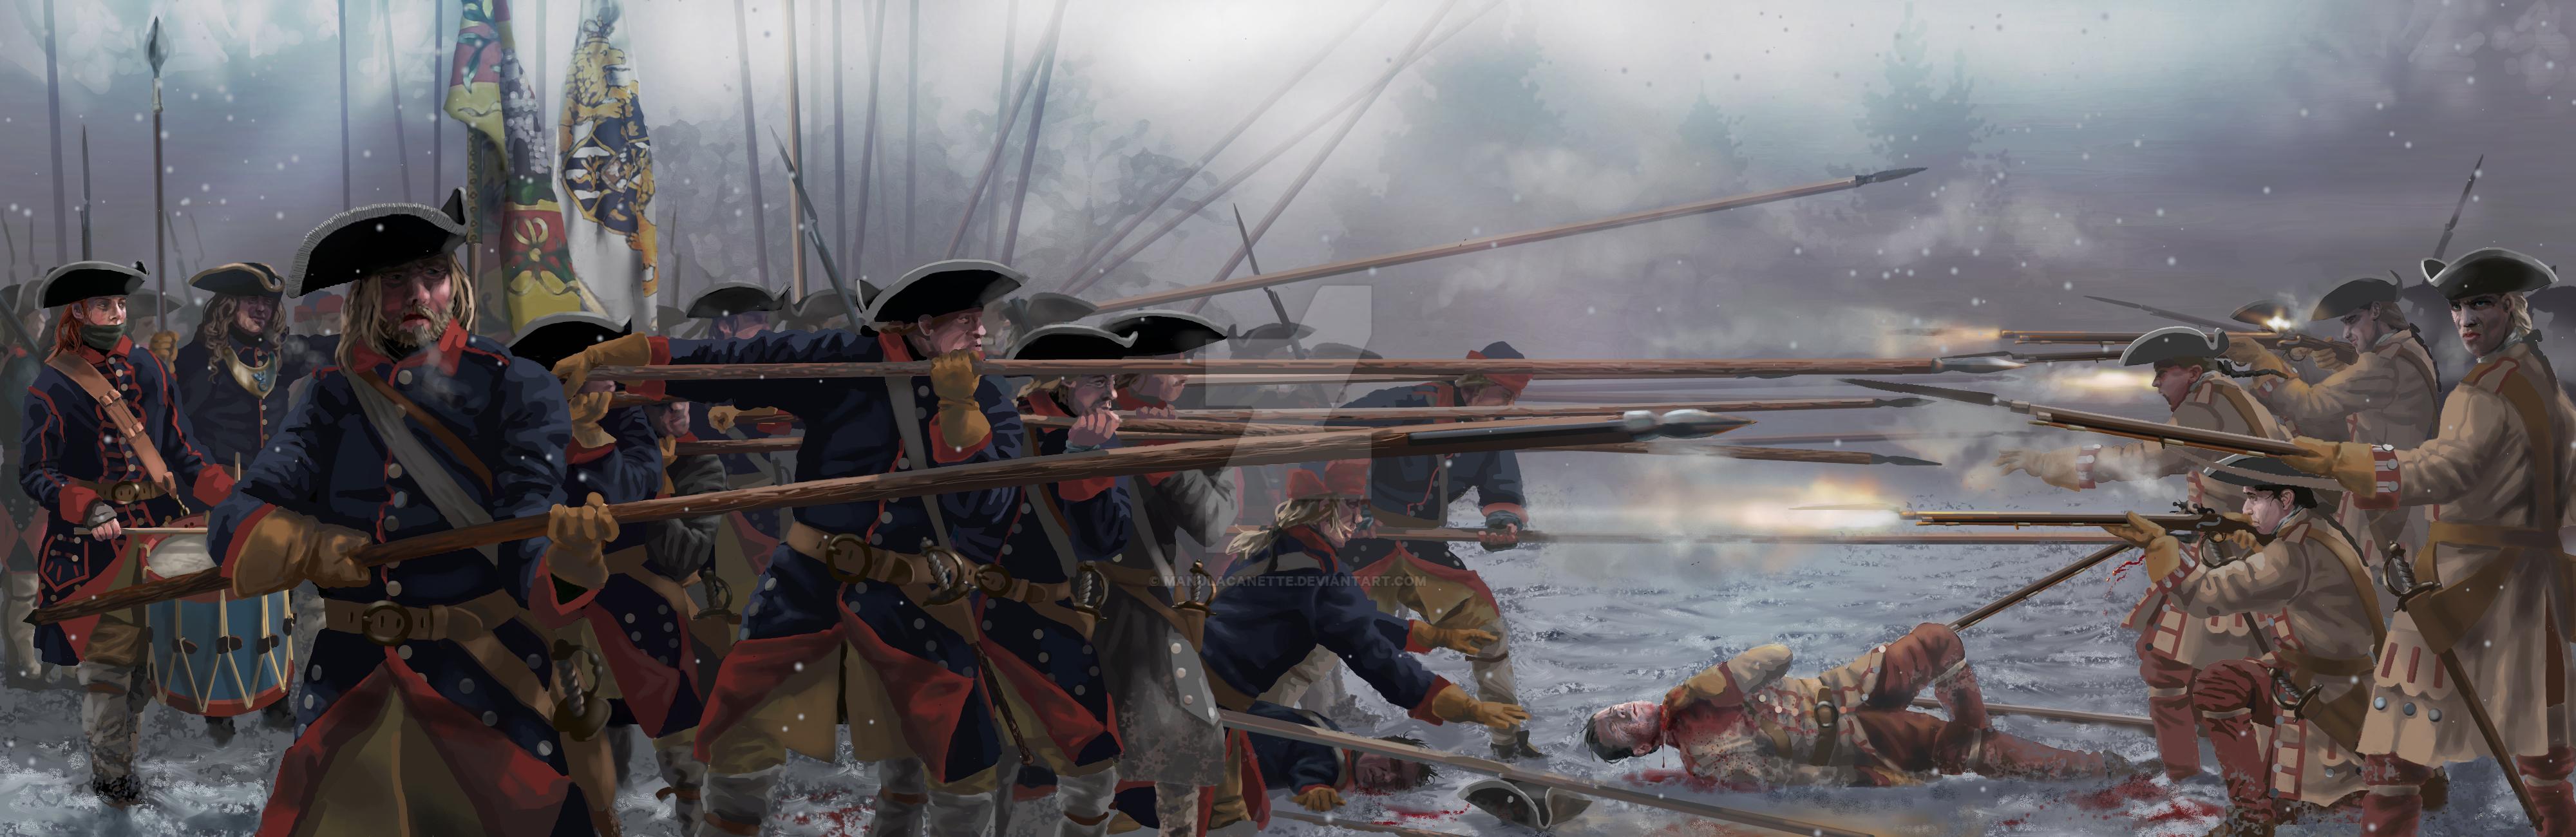 Battle of Helsingborg (1710) - Jonkoping Regemente by ManuLaCanette